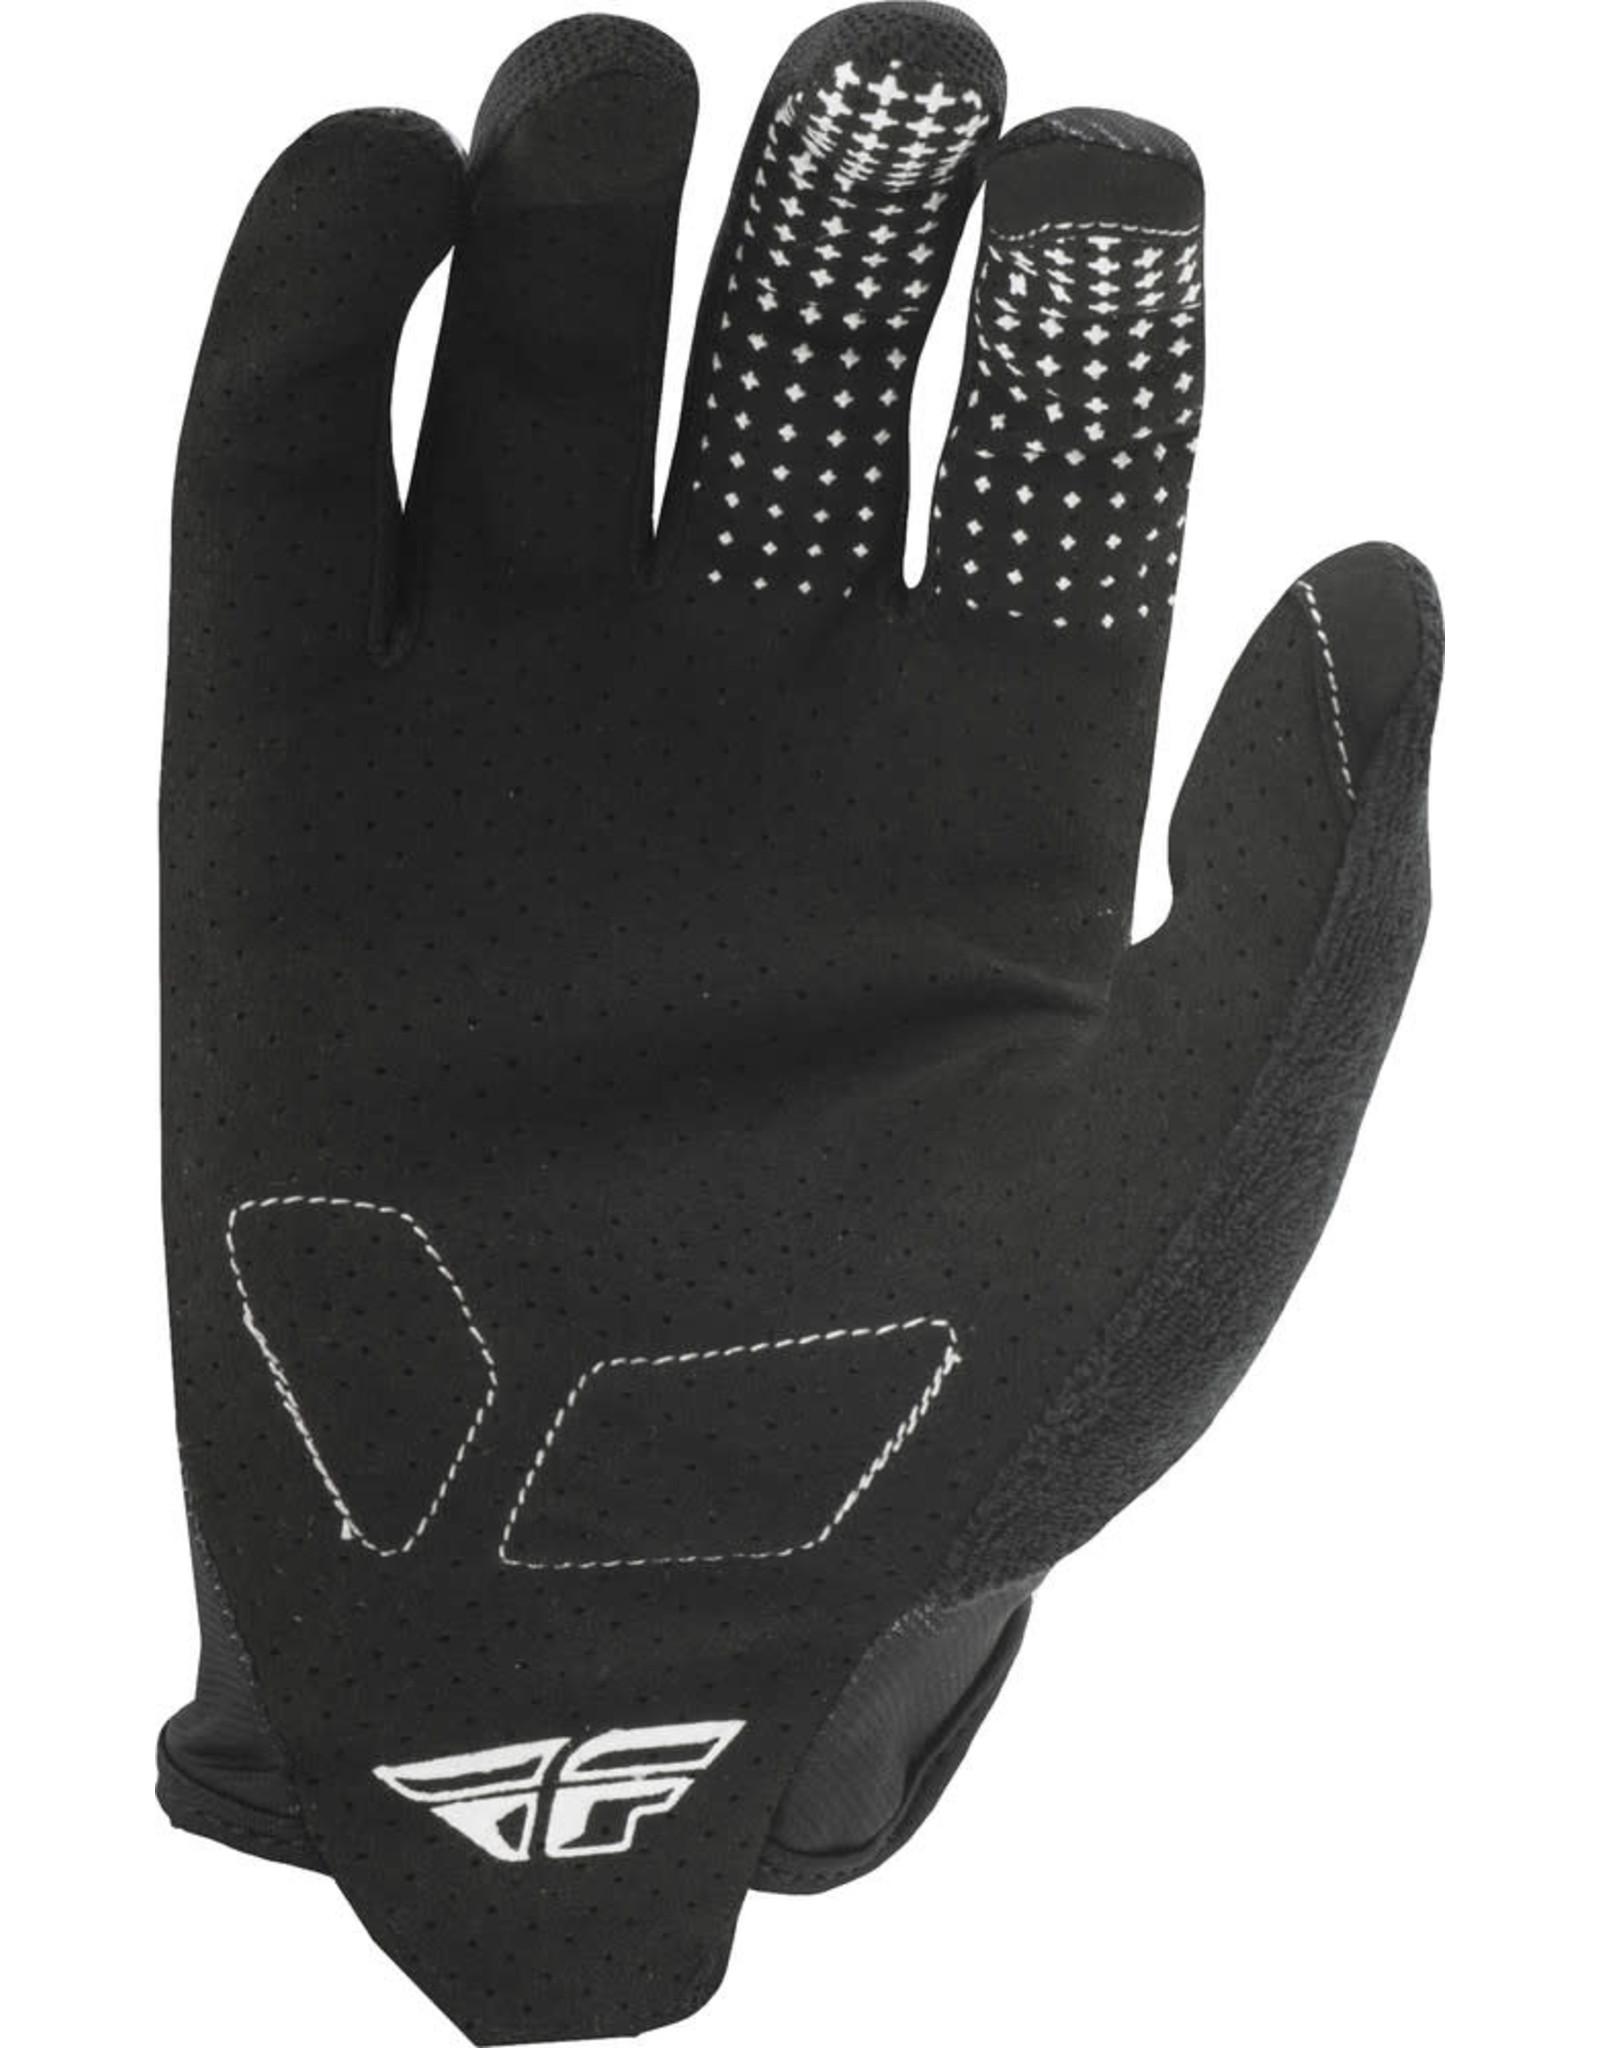 FLY RACING Media Glove